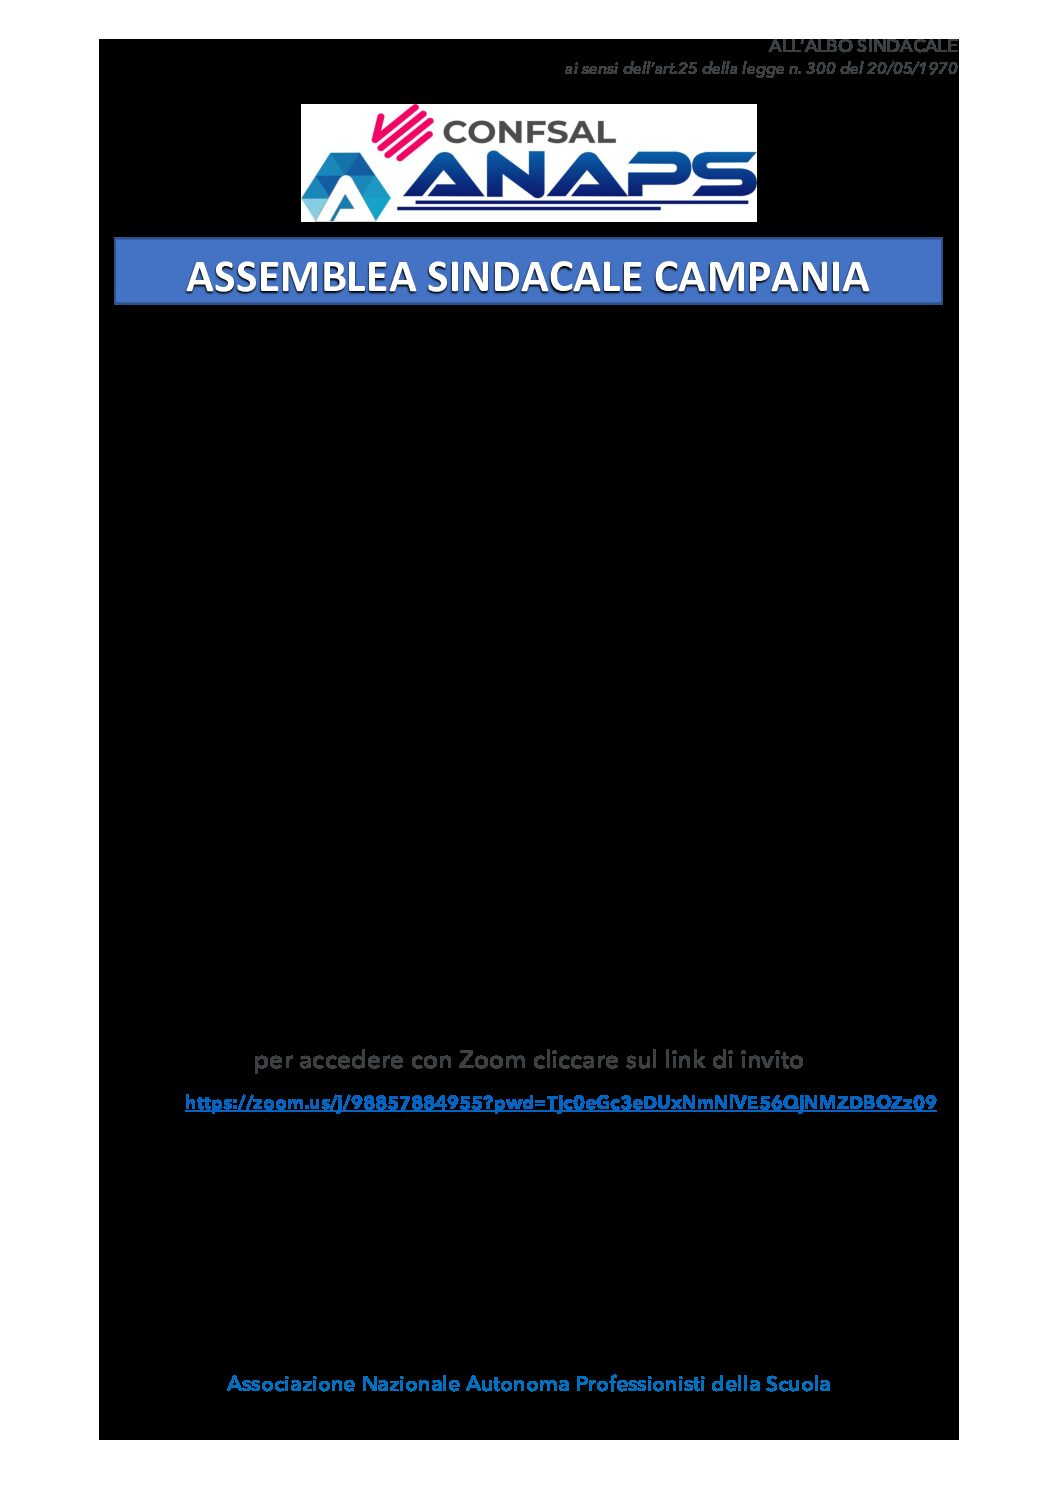 Assembela Sindacale Confsal Anaps Campania 26 Marzo 2021